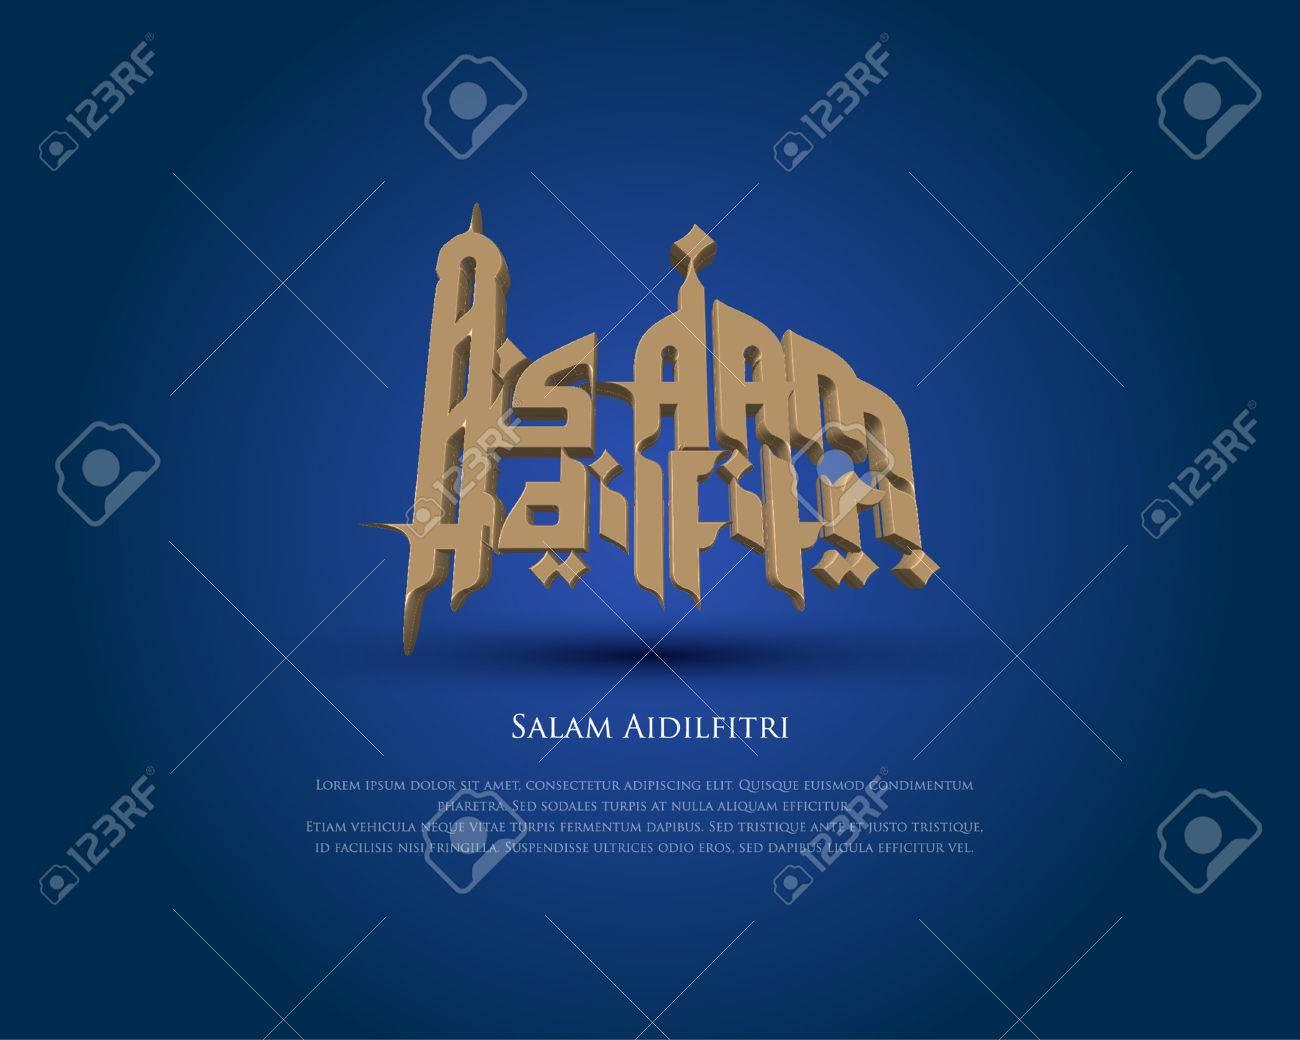 Salam aidilfitri translation hari raya greetings royalty free hari raya greetings salam aidilfitri translation kristyandbryce Image collections